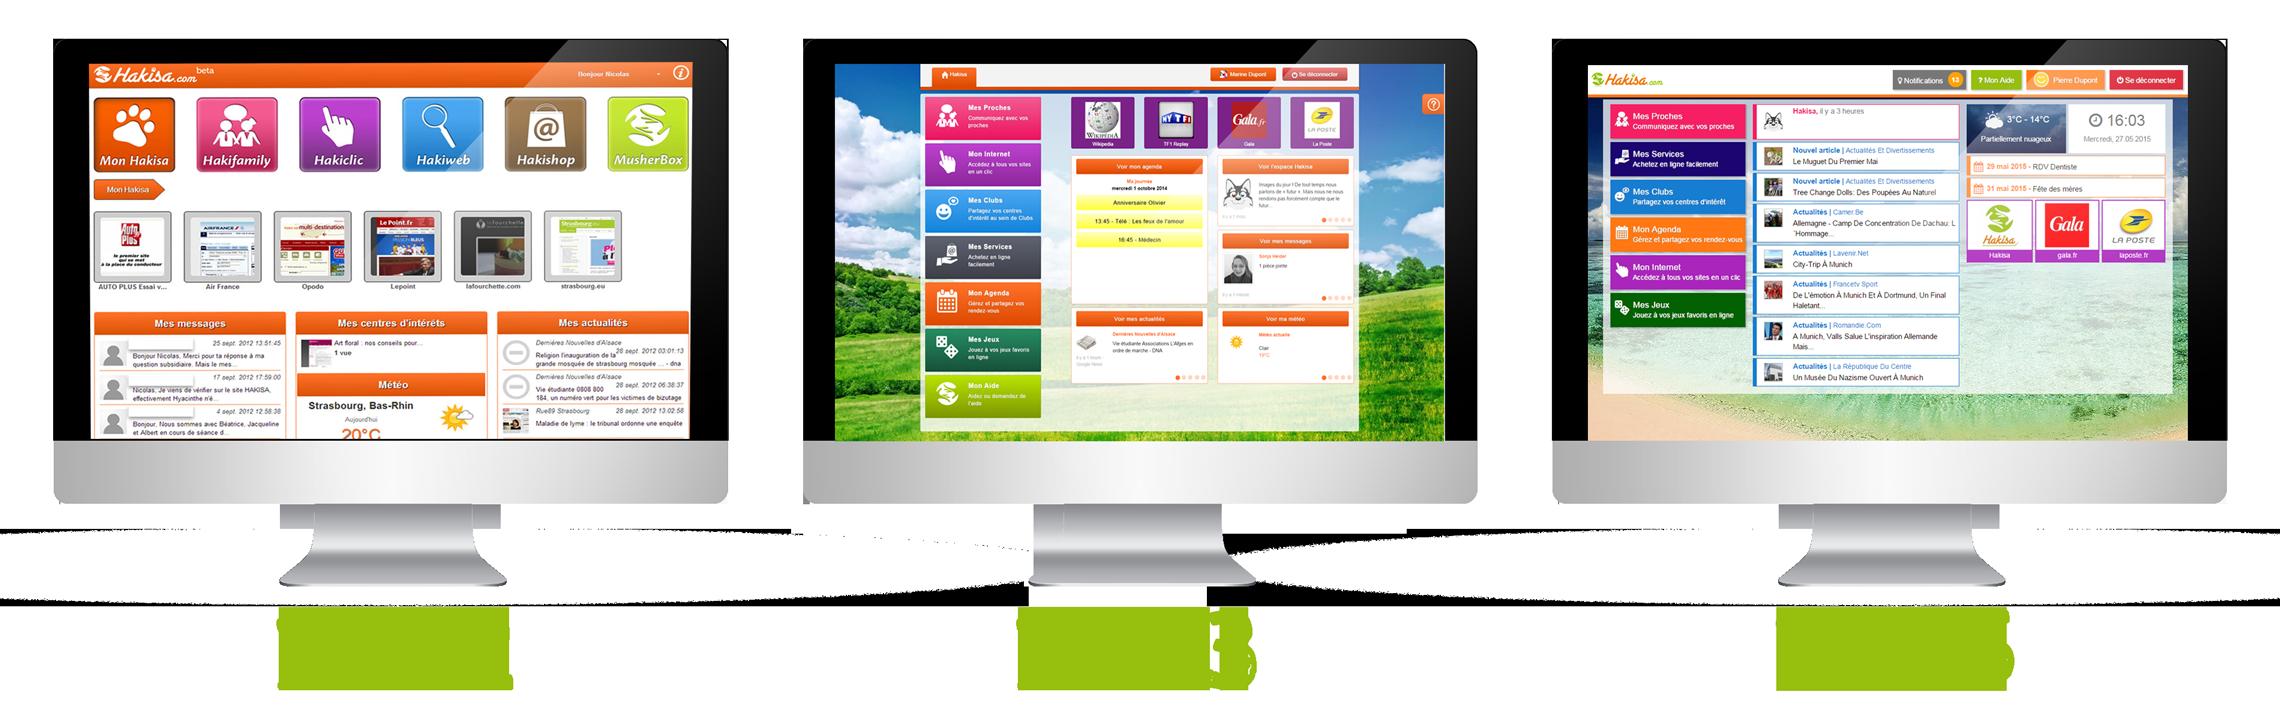 Le hub social et son évolution : 2012, 2013, 2015